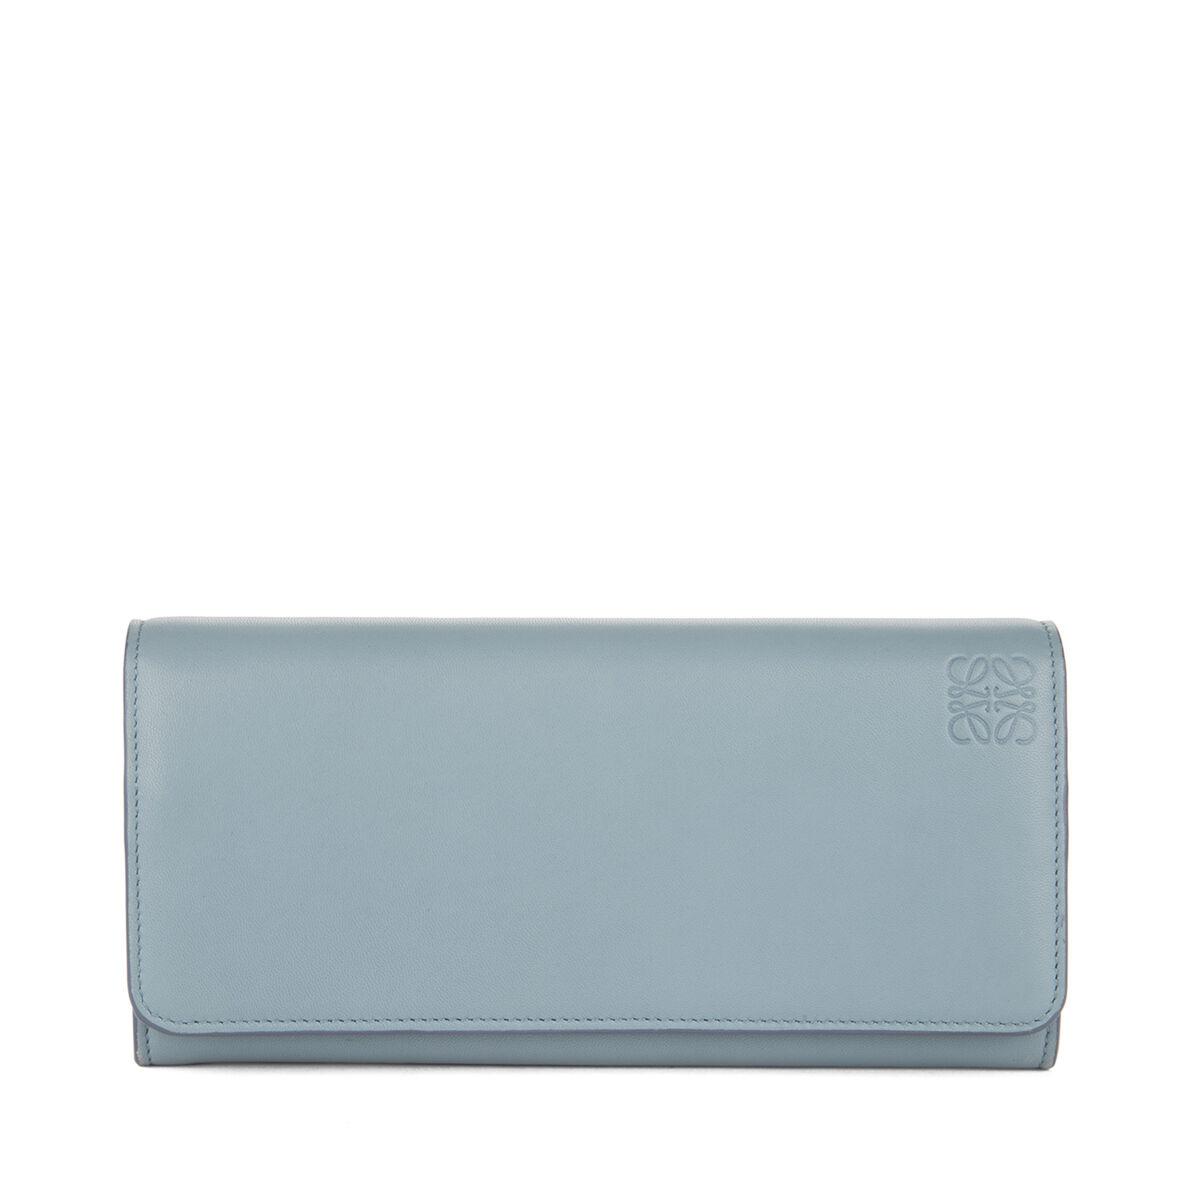 LOEWE Billetero Continental Azul Piedra/Marfil front